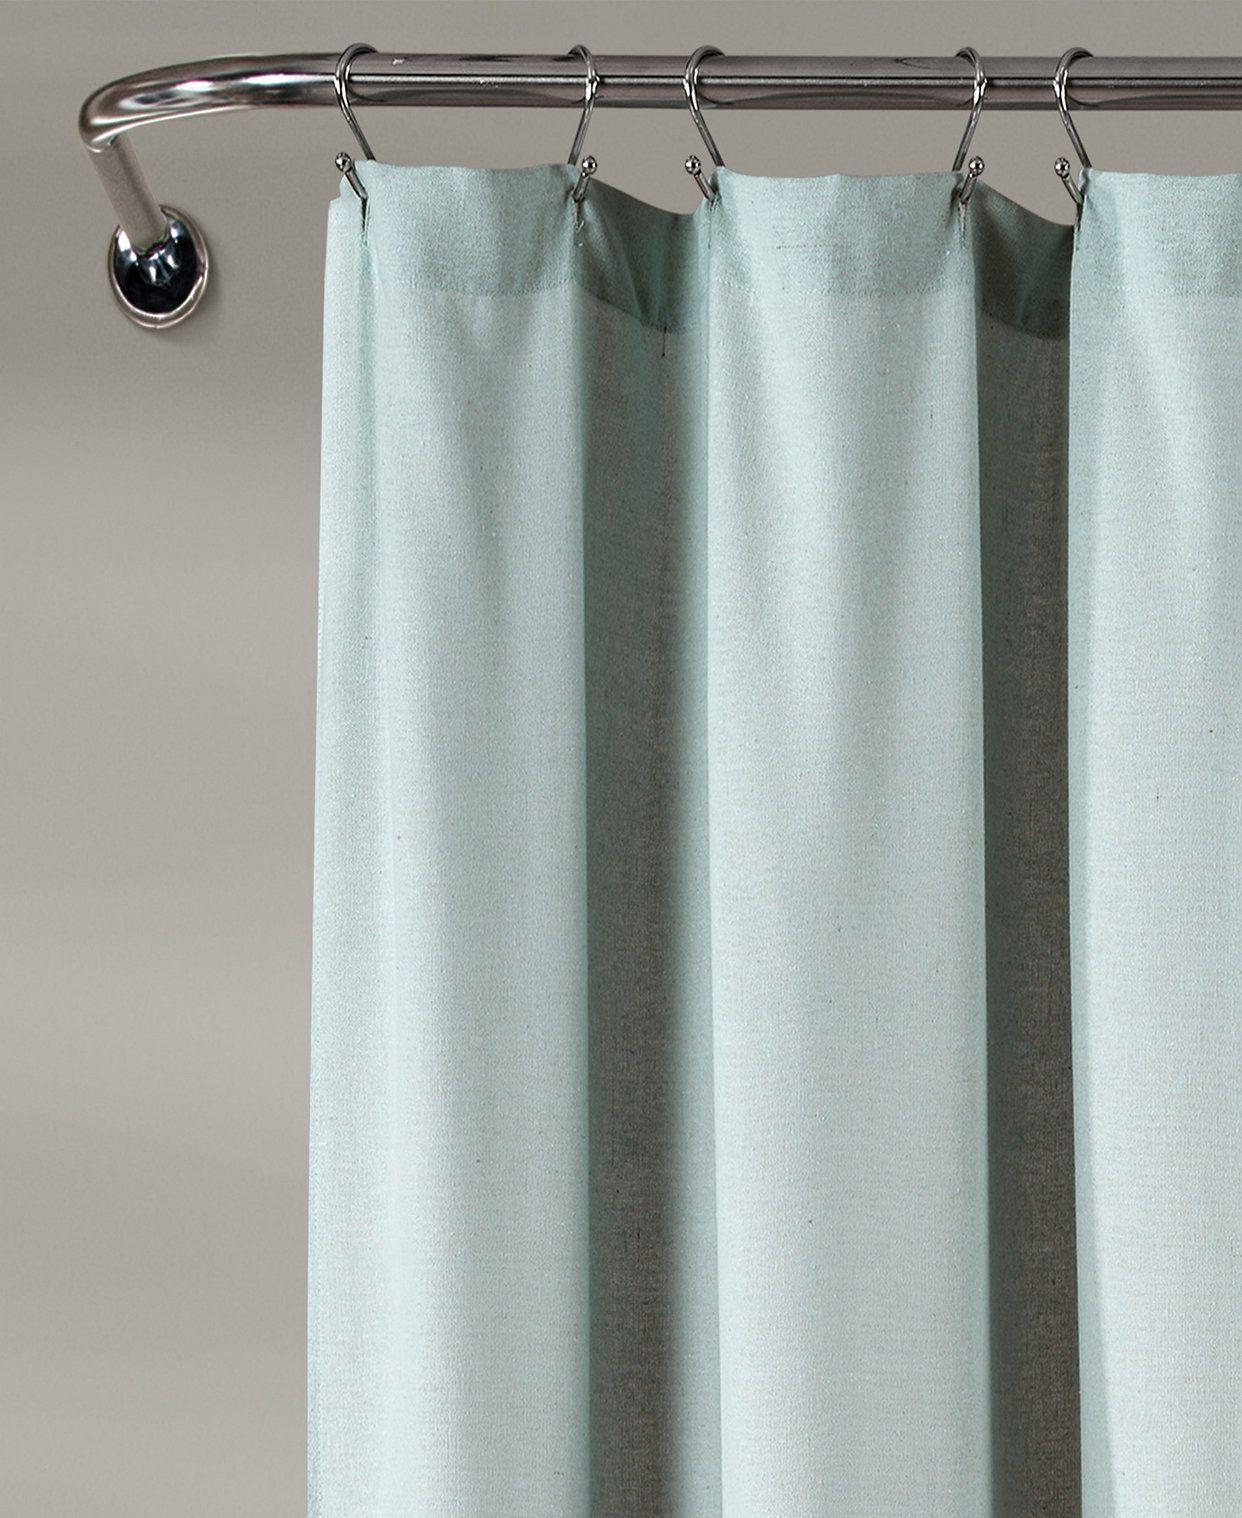 Lush Decor Linen Button 72 In 2020 Lush Decor Curtains Shower Curtain